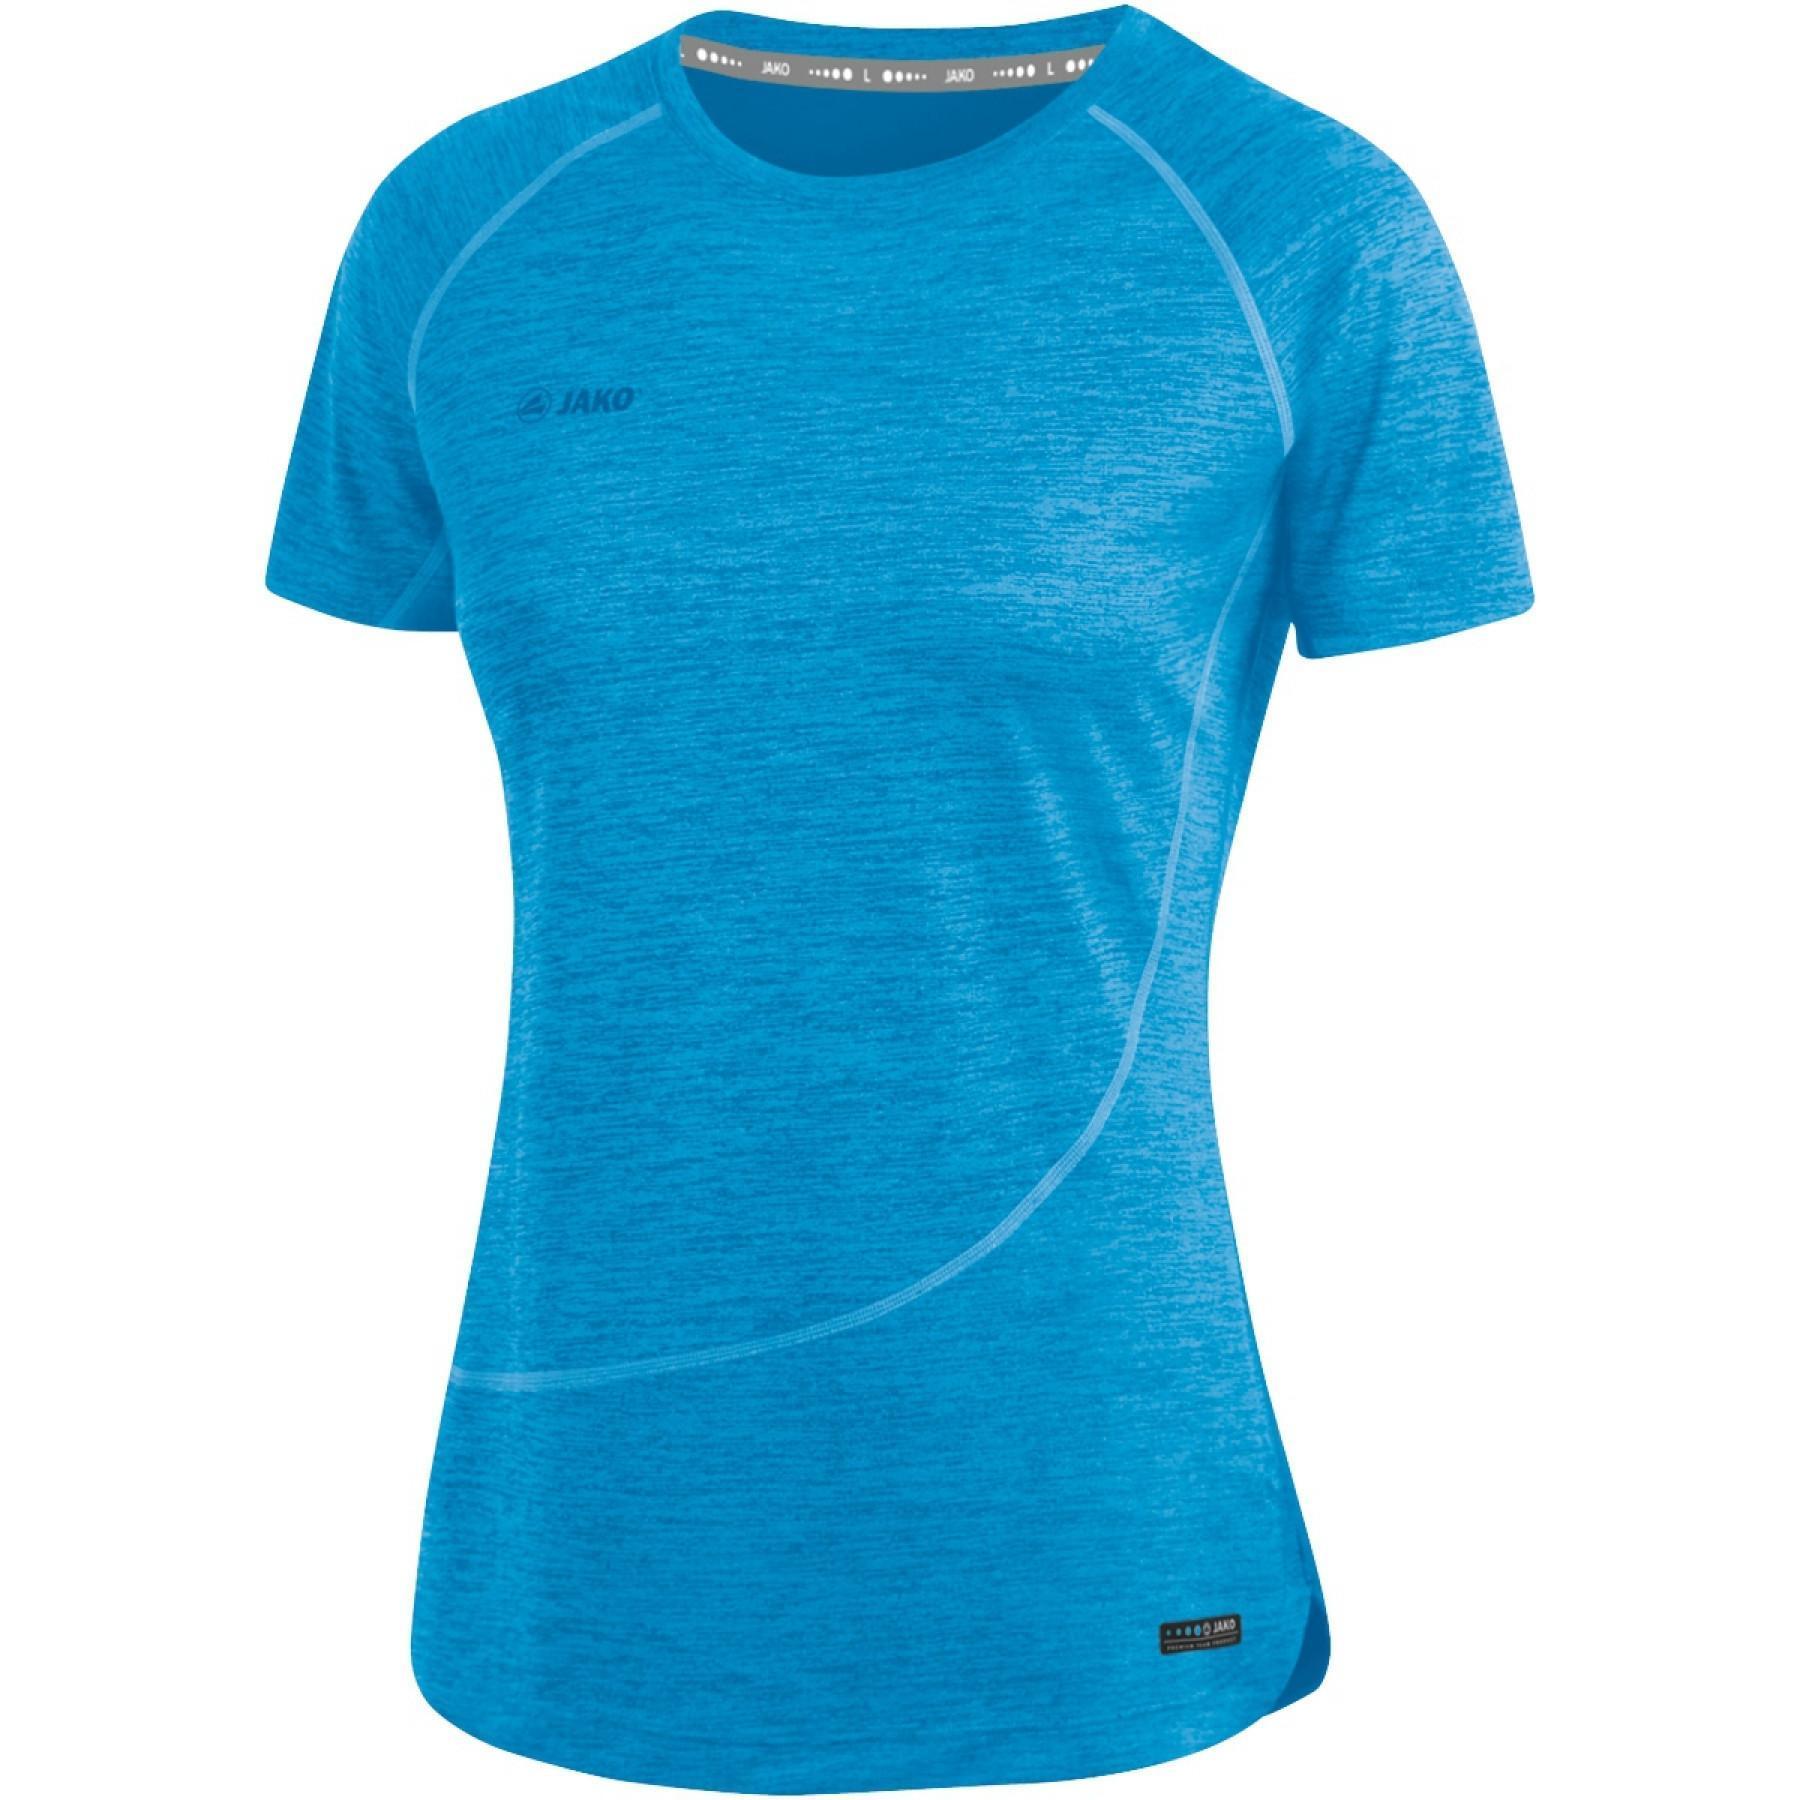 T-shirt woman Jako Active Basics